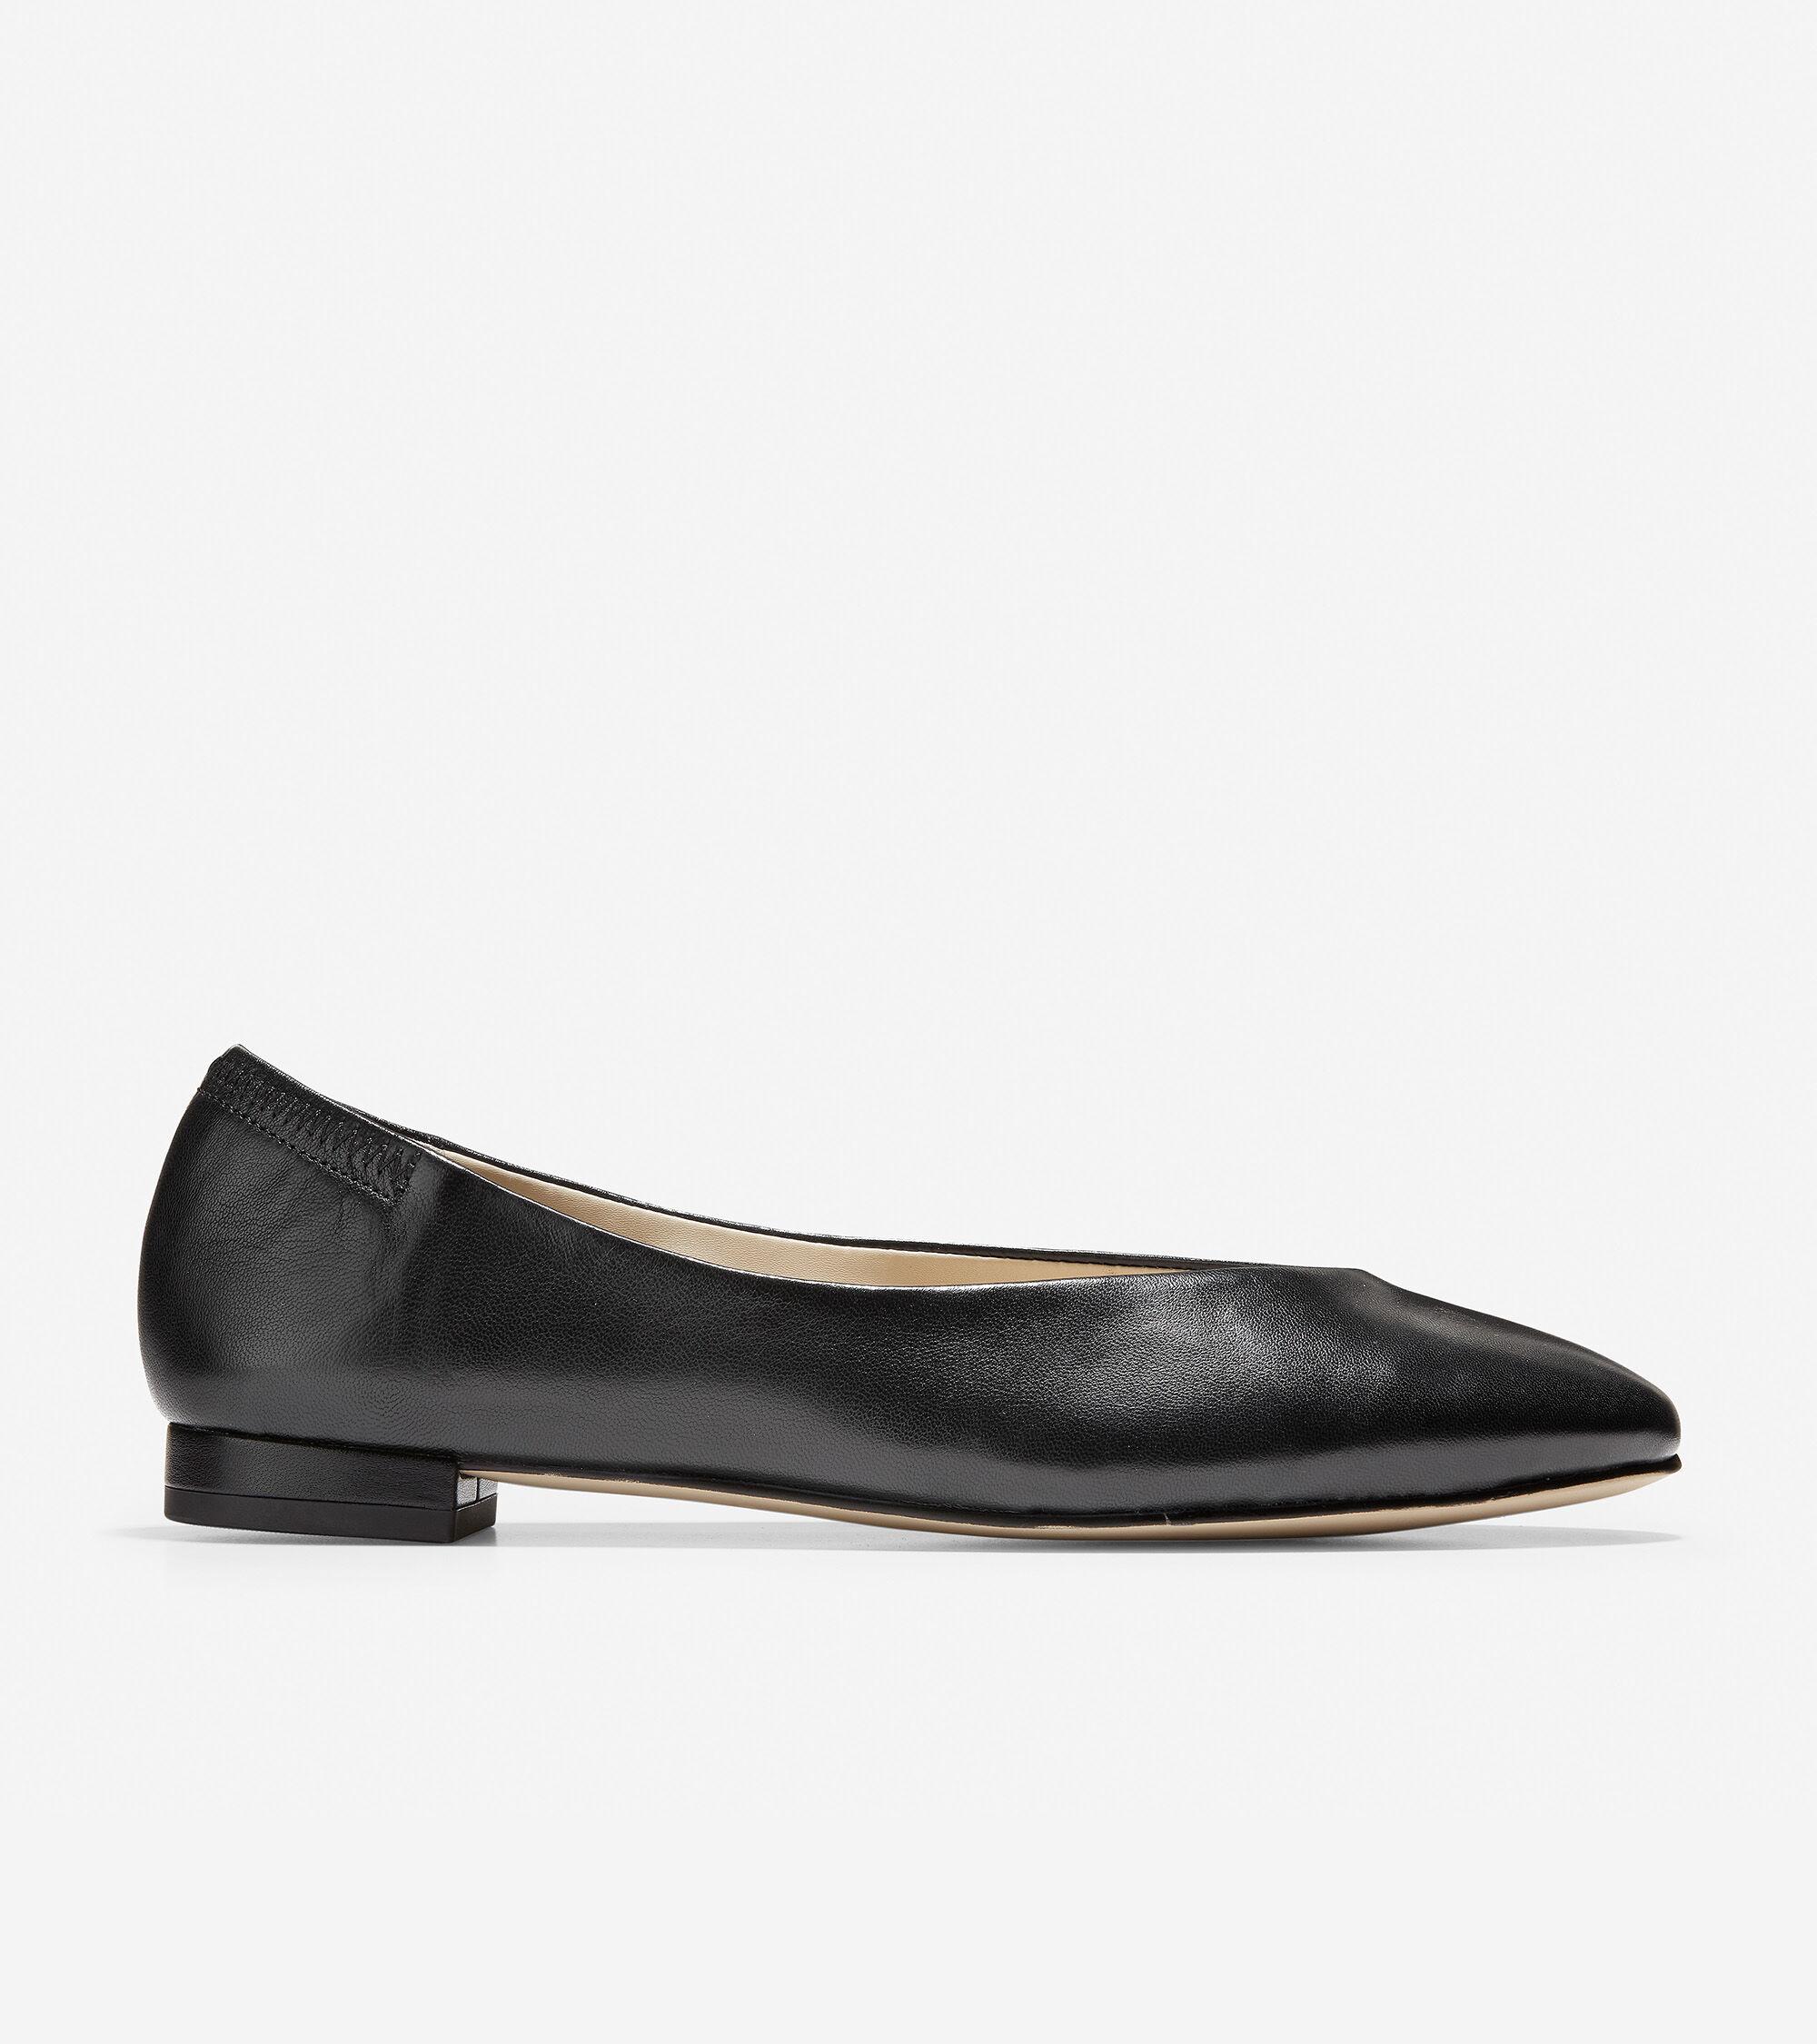 f794b5717fe Women s Kaia Ballet Flats in Black Leather